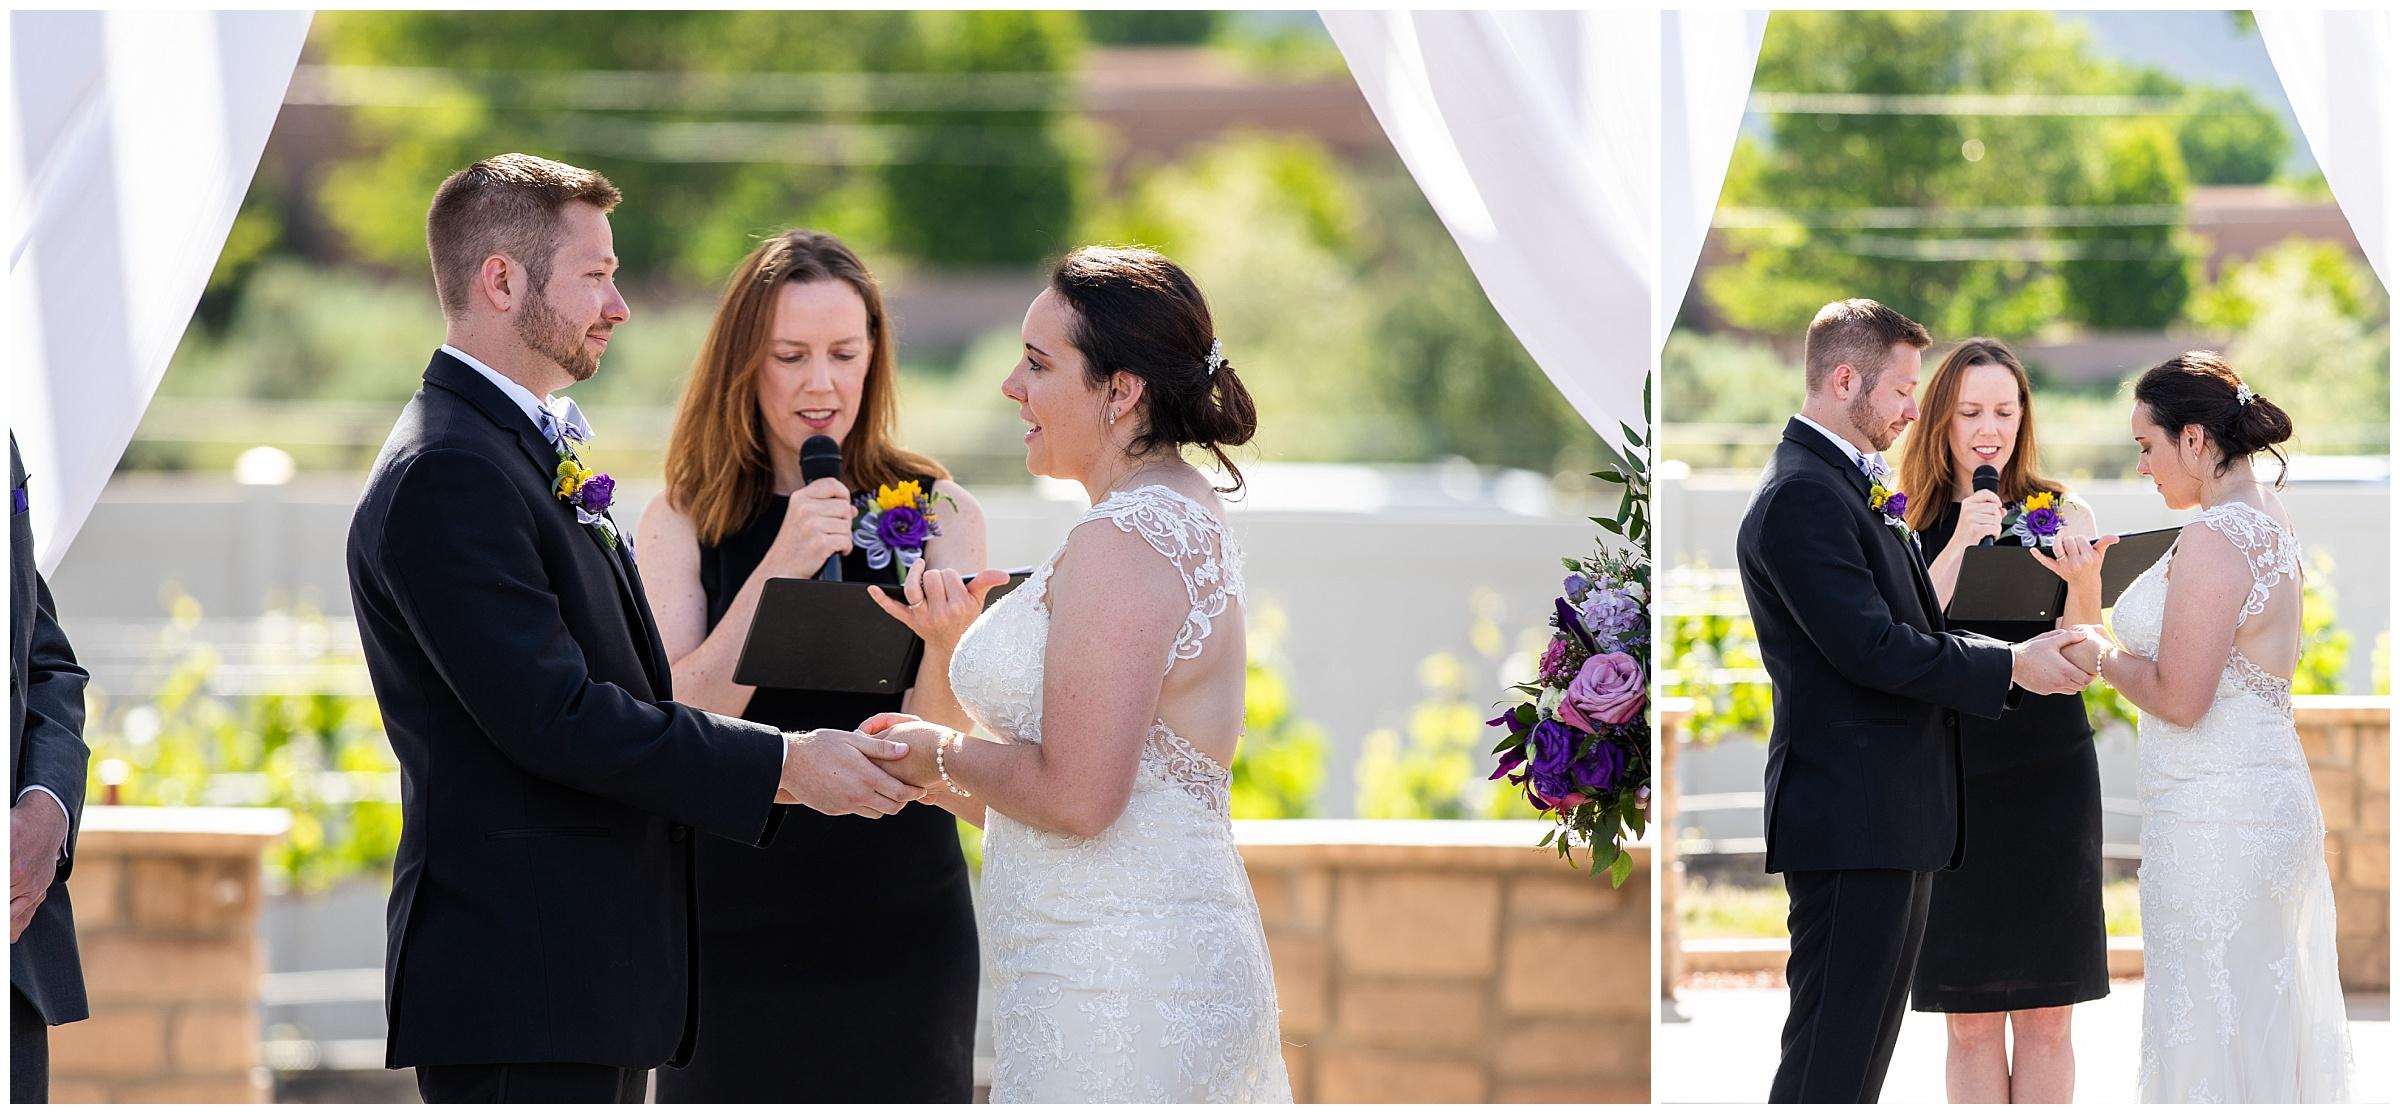 Grand Junction Wedding Photographer 0045.jpg